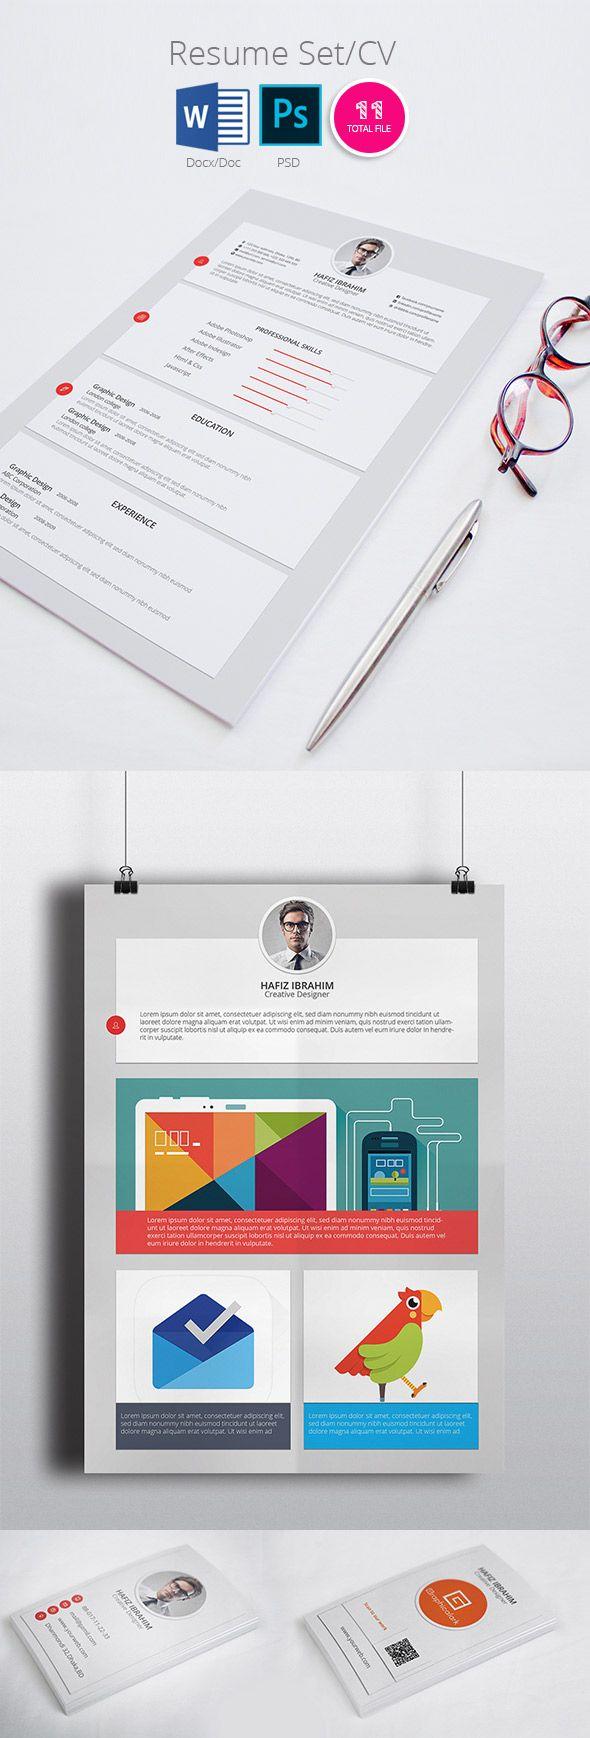 Modern ResumeCv Template Design  Layout  Editorial Design